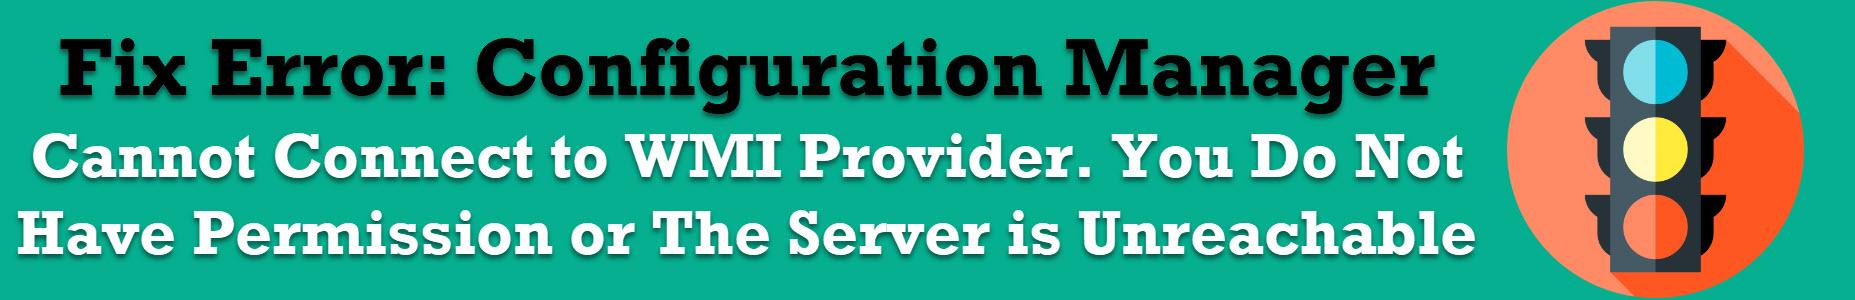 WMI Provider